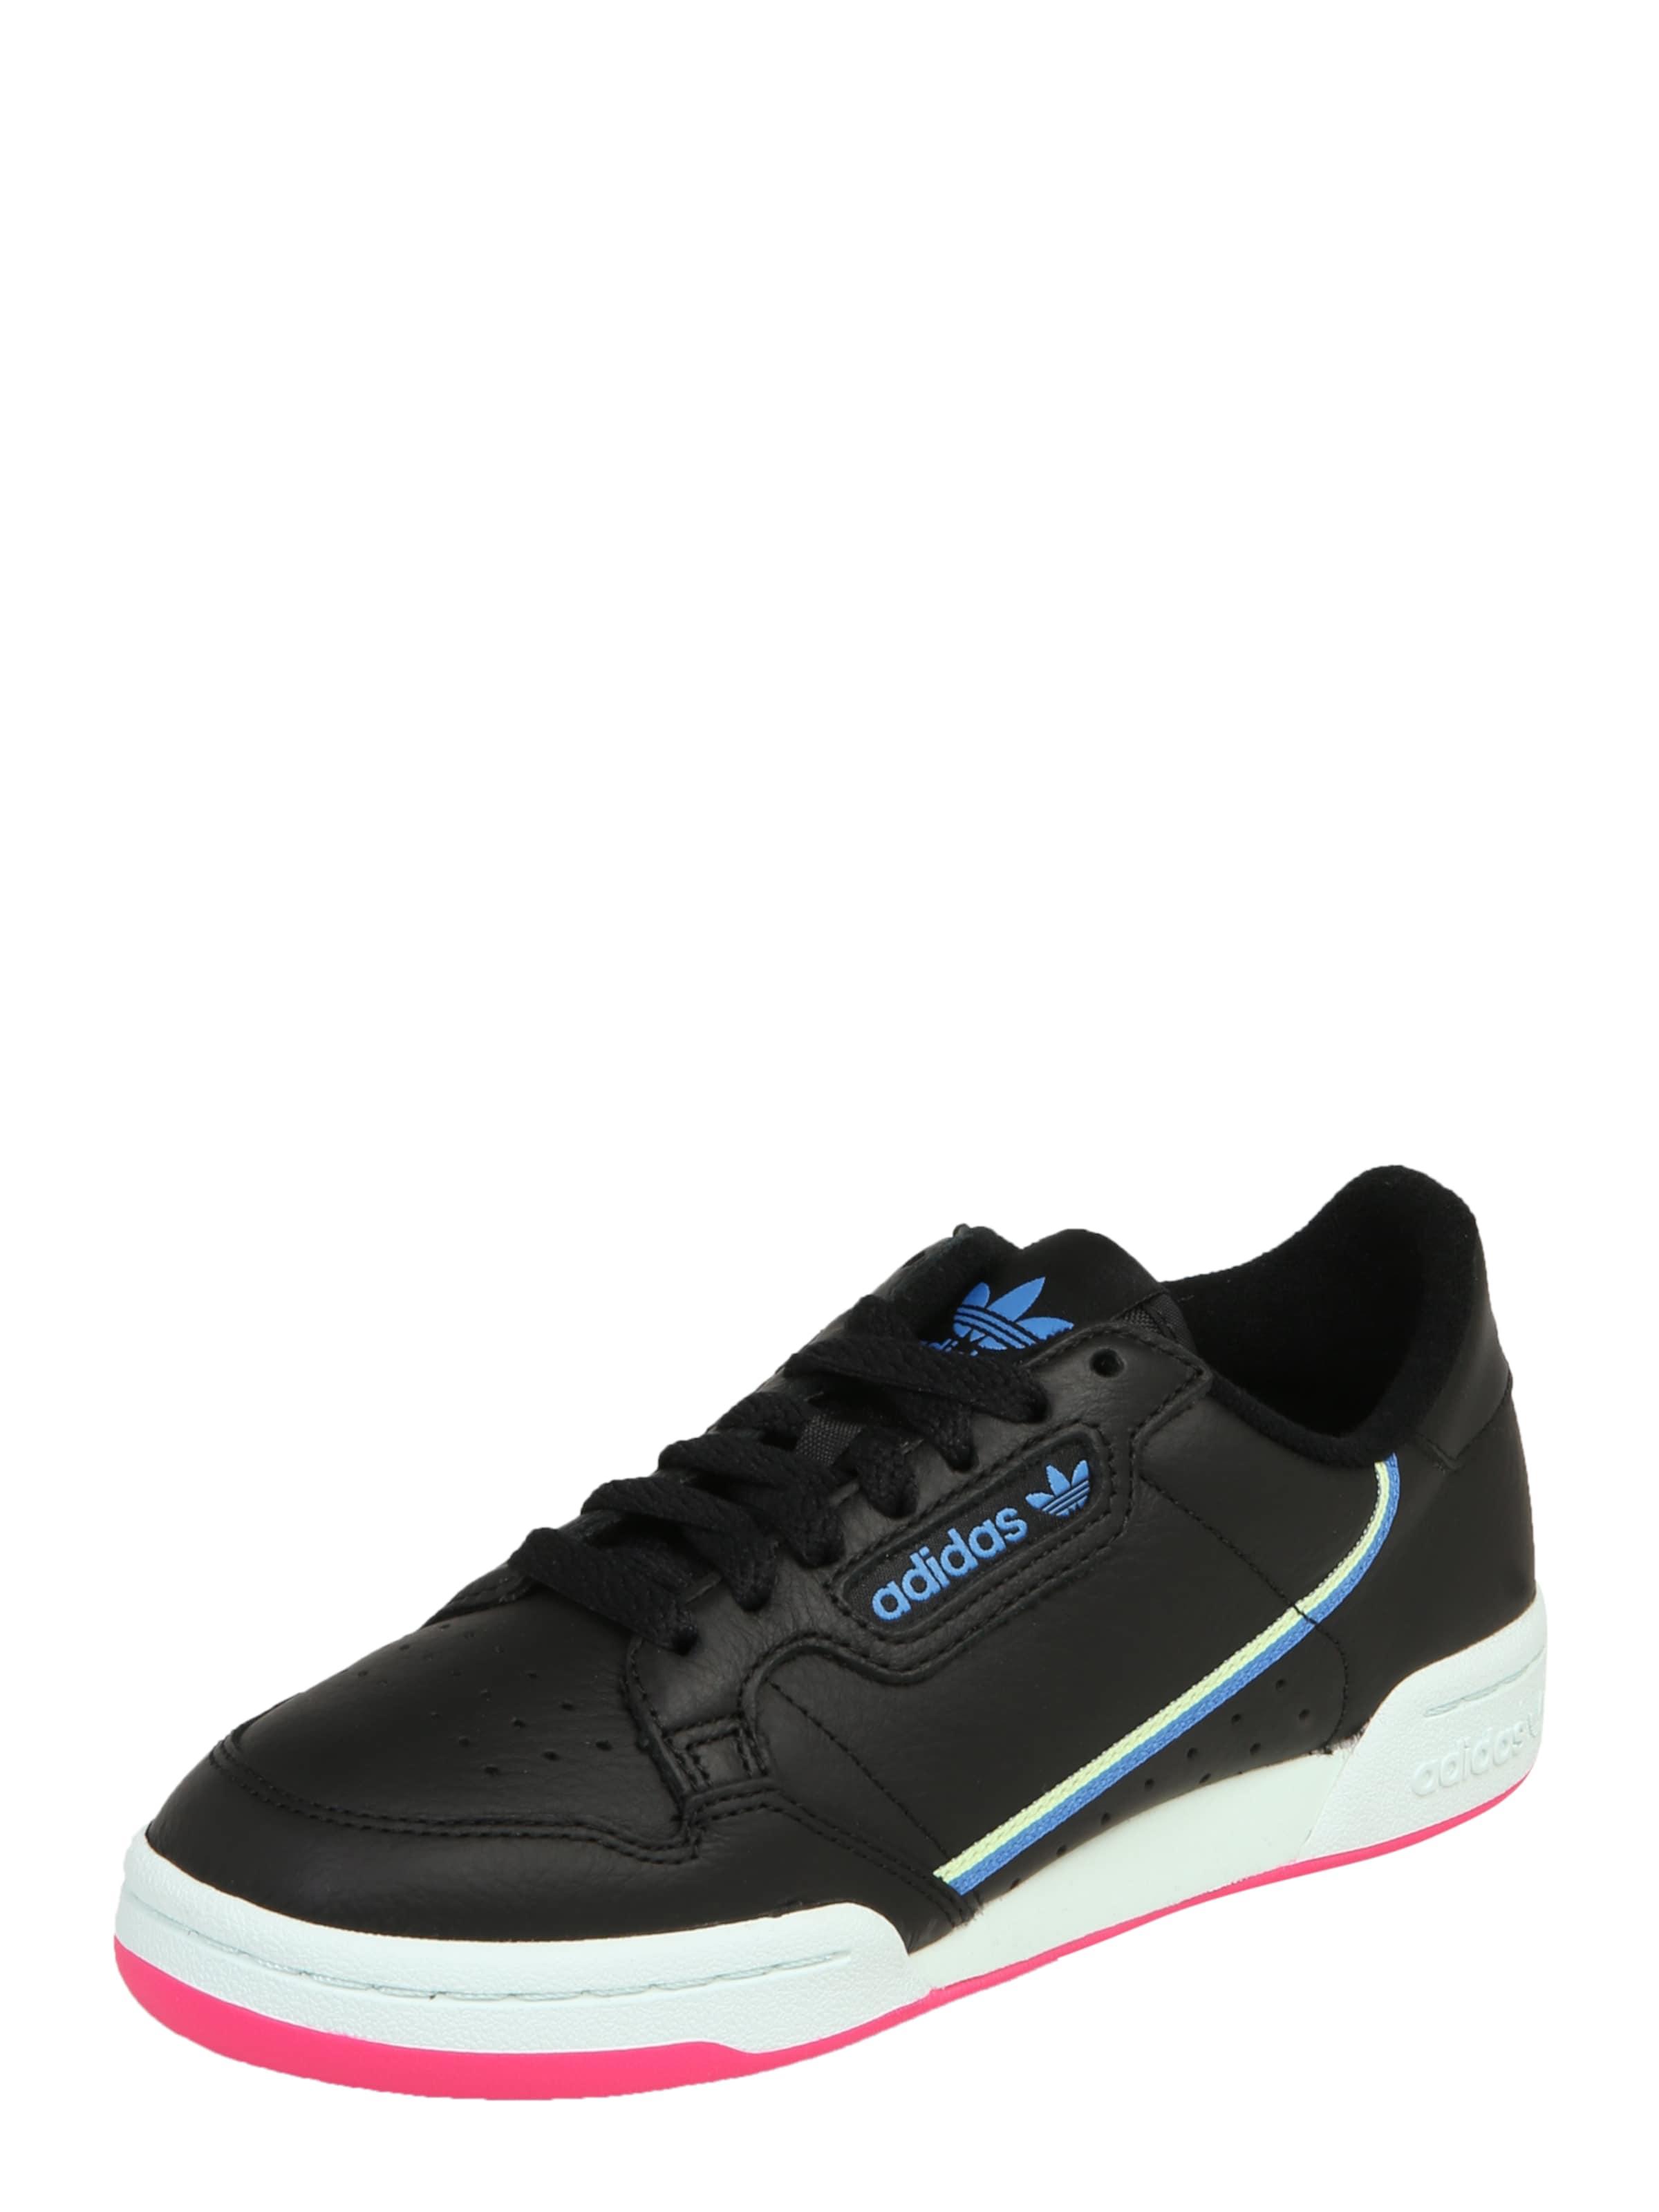 80' Originals Weiß In 'continental Adidas Sneaker wNv0m8n